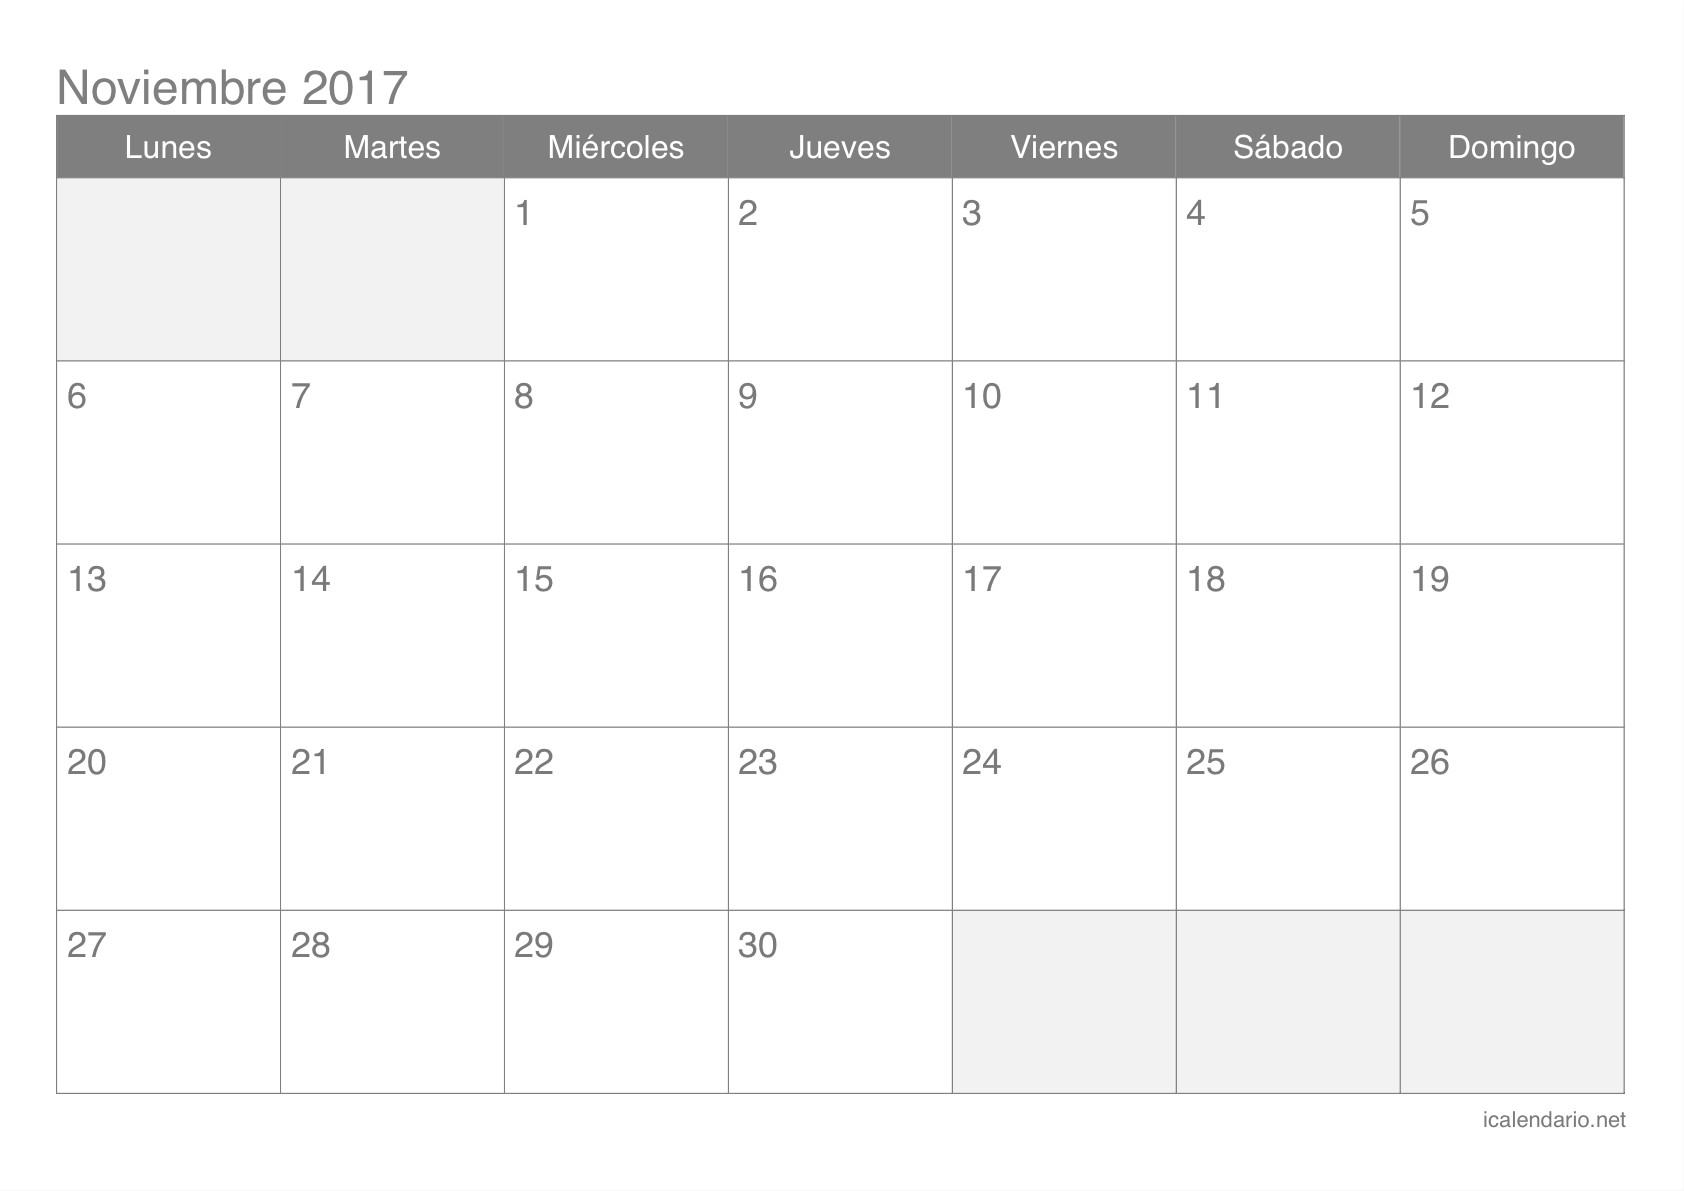 Calendario Noviembre 2019 Argentina Para Imprimir Más Recientes Calendario Noviembre 2017 Para Imprimir Icalendario Of Calendario Noviembre 2019 Argentina Para Imprimir Más Actual Custom Editable Free Printable 2019 Calendars